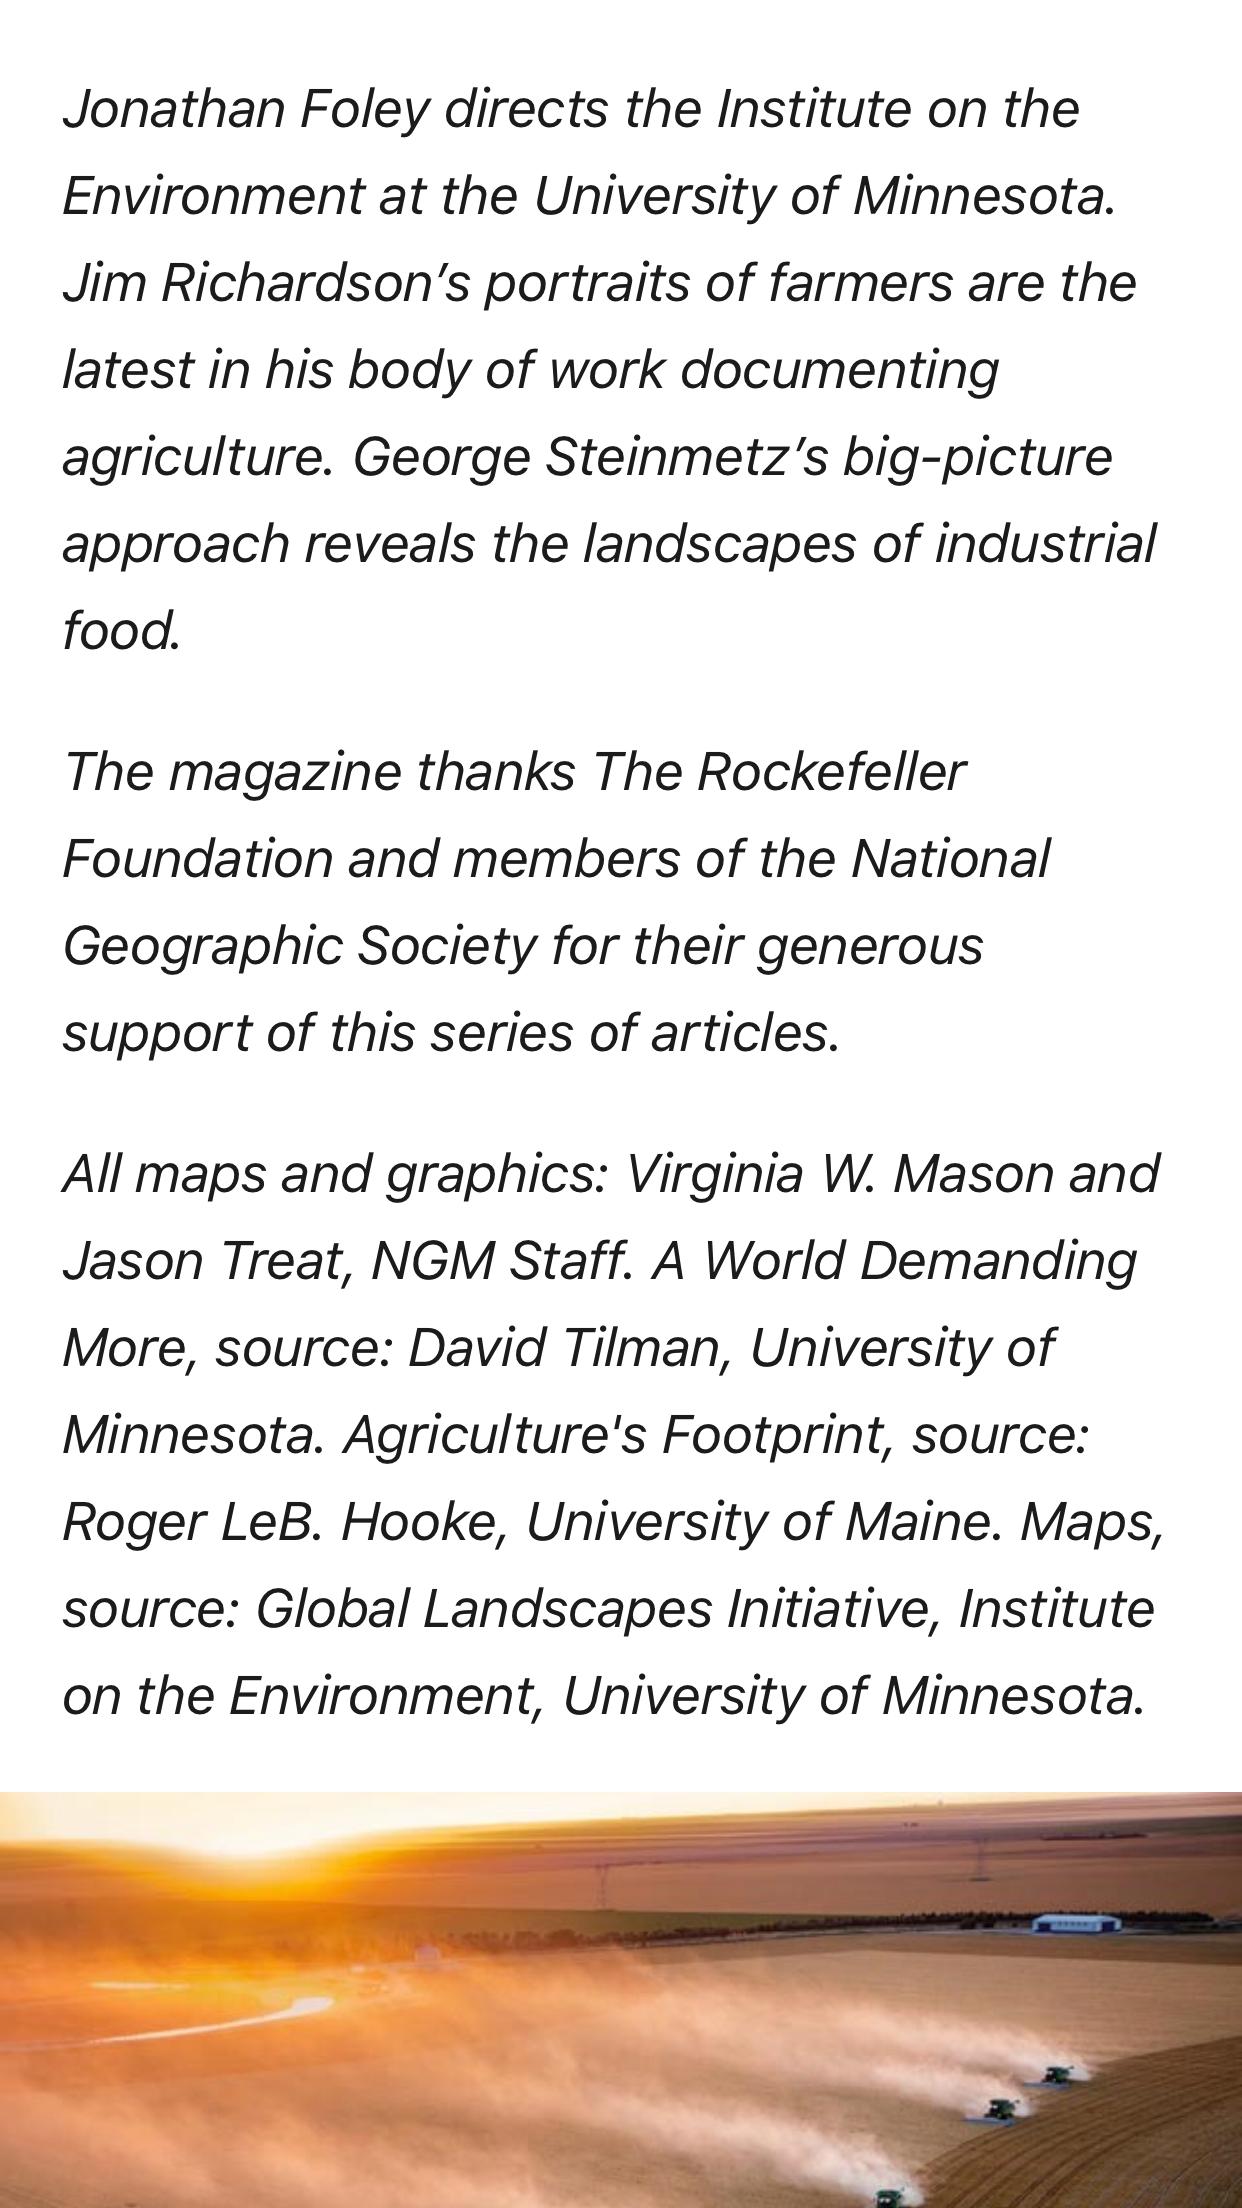 103018 In 2020 University Of Minnesota Big Picture Farmer